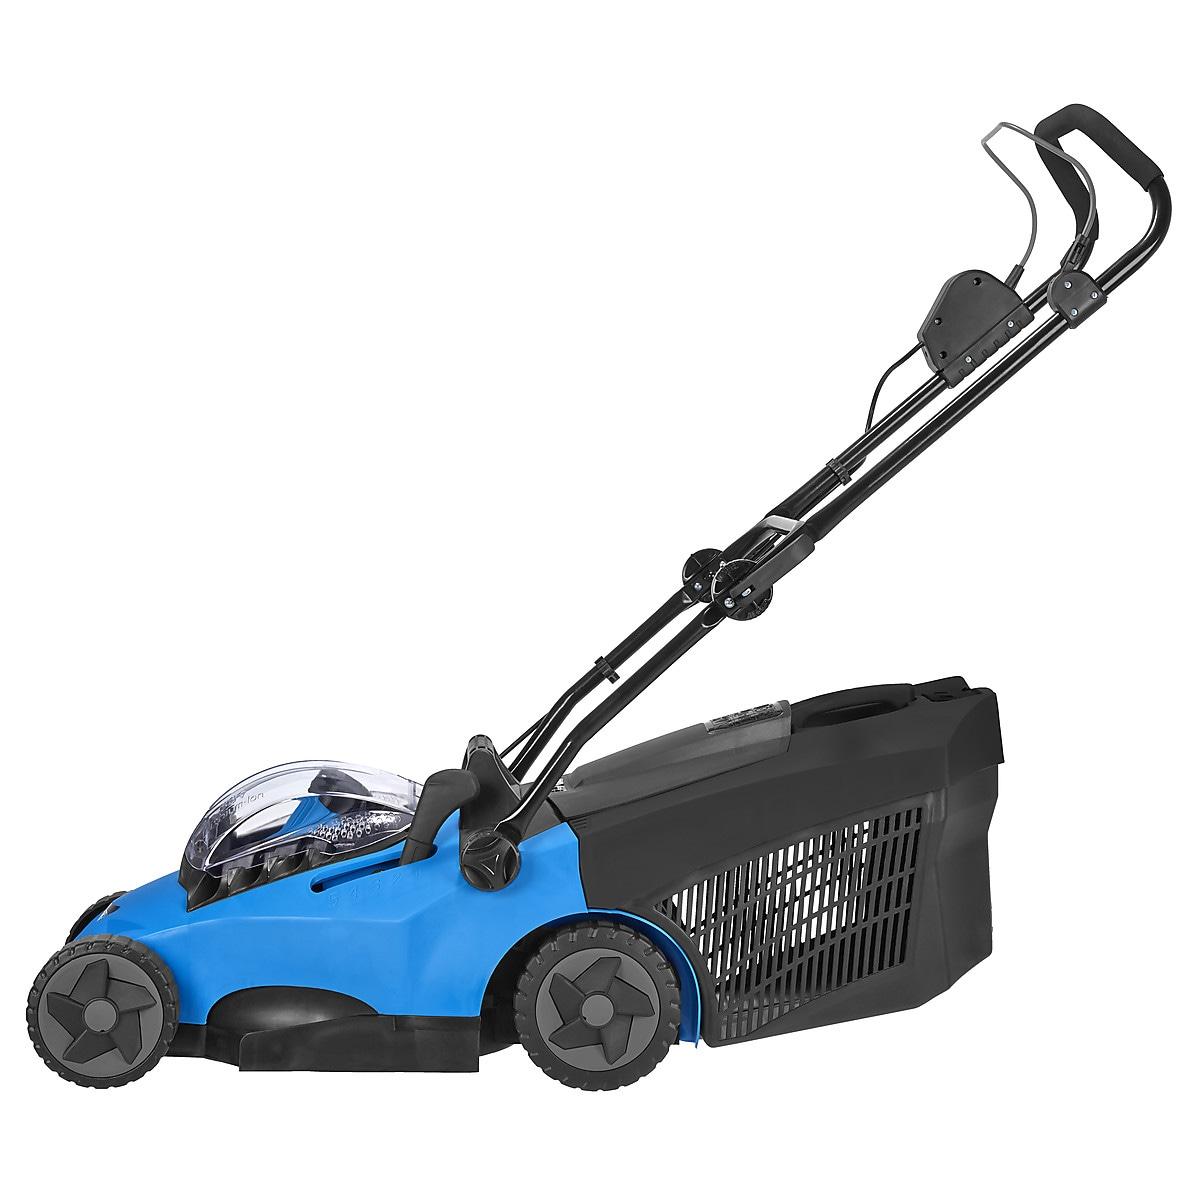 Cocraft LM37 36 V LI Lawnmower